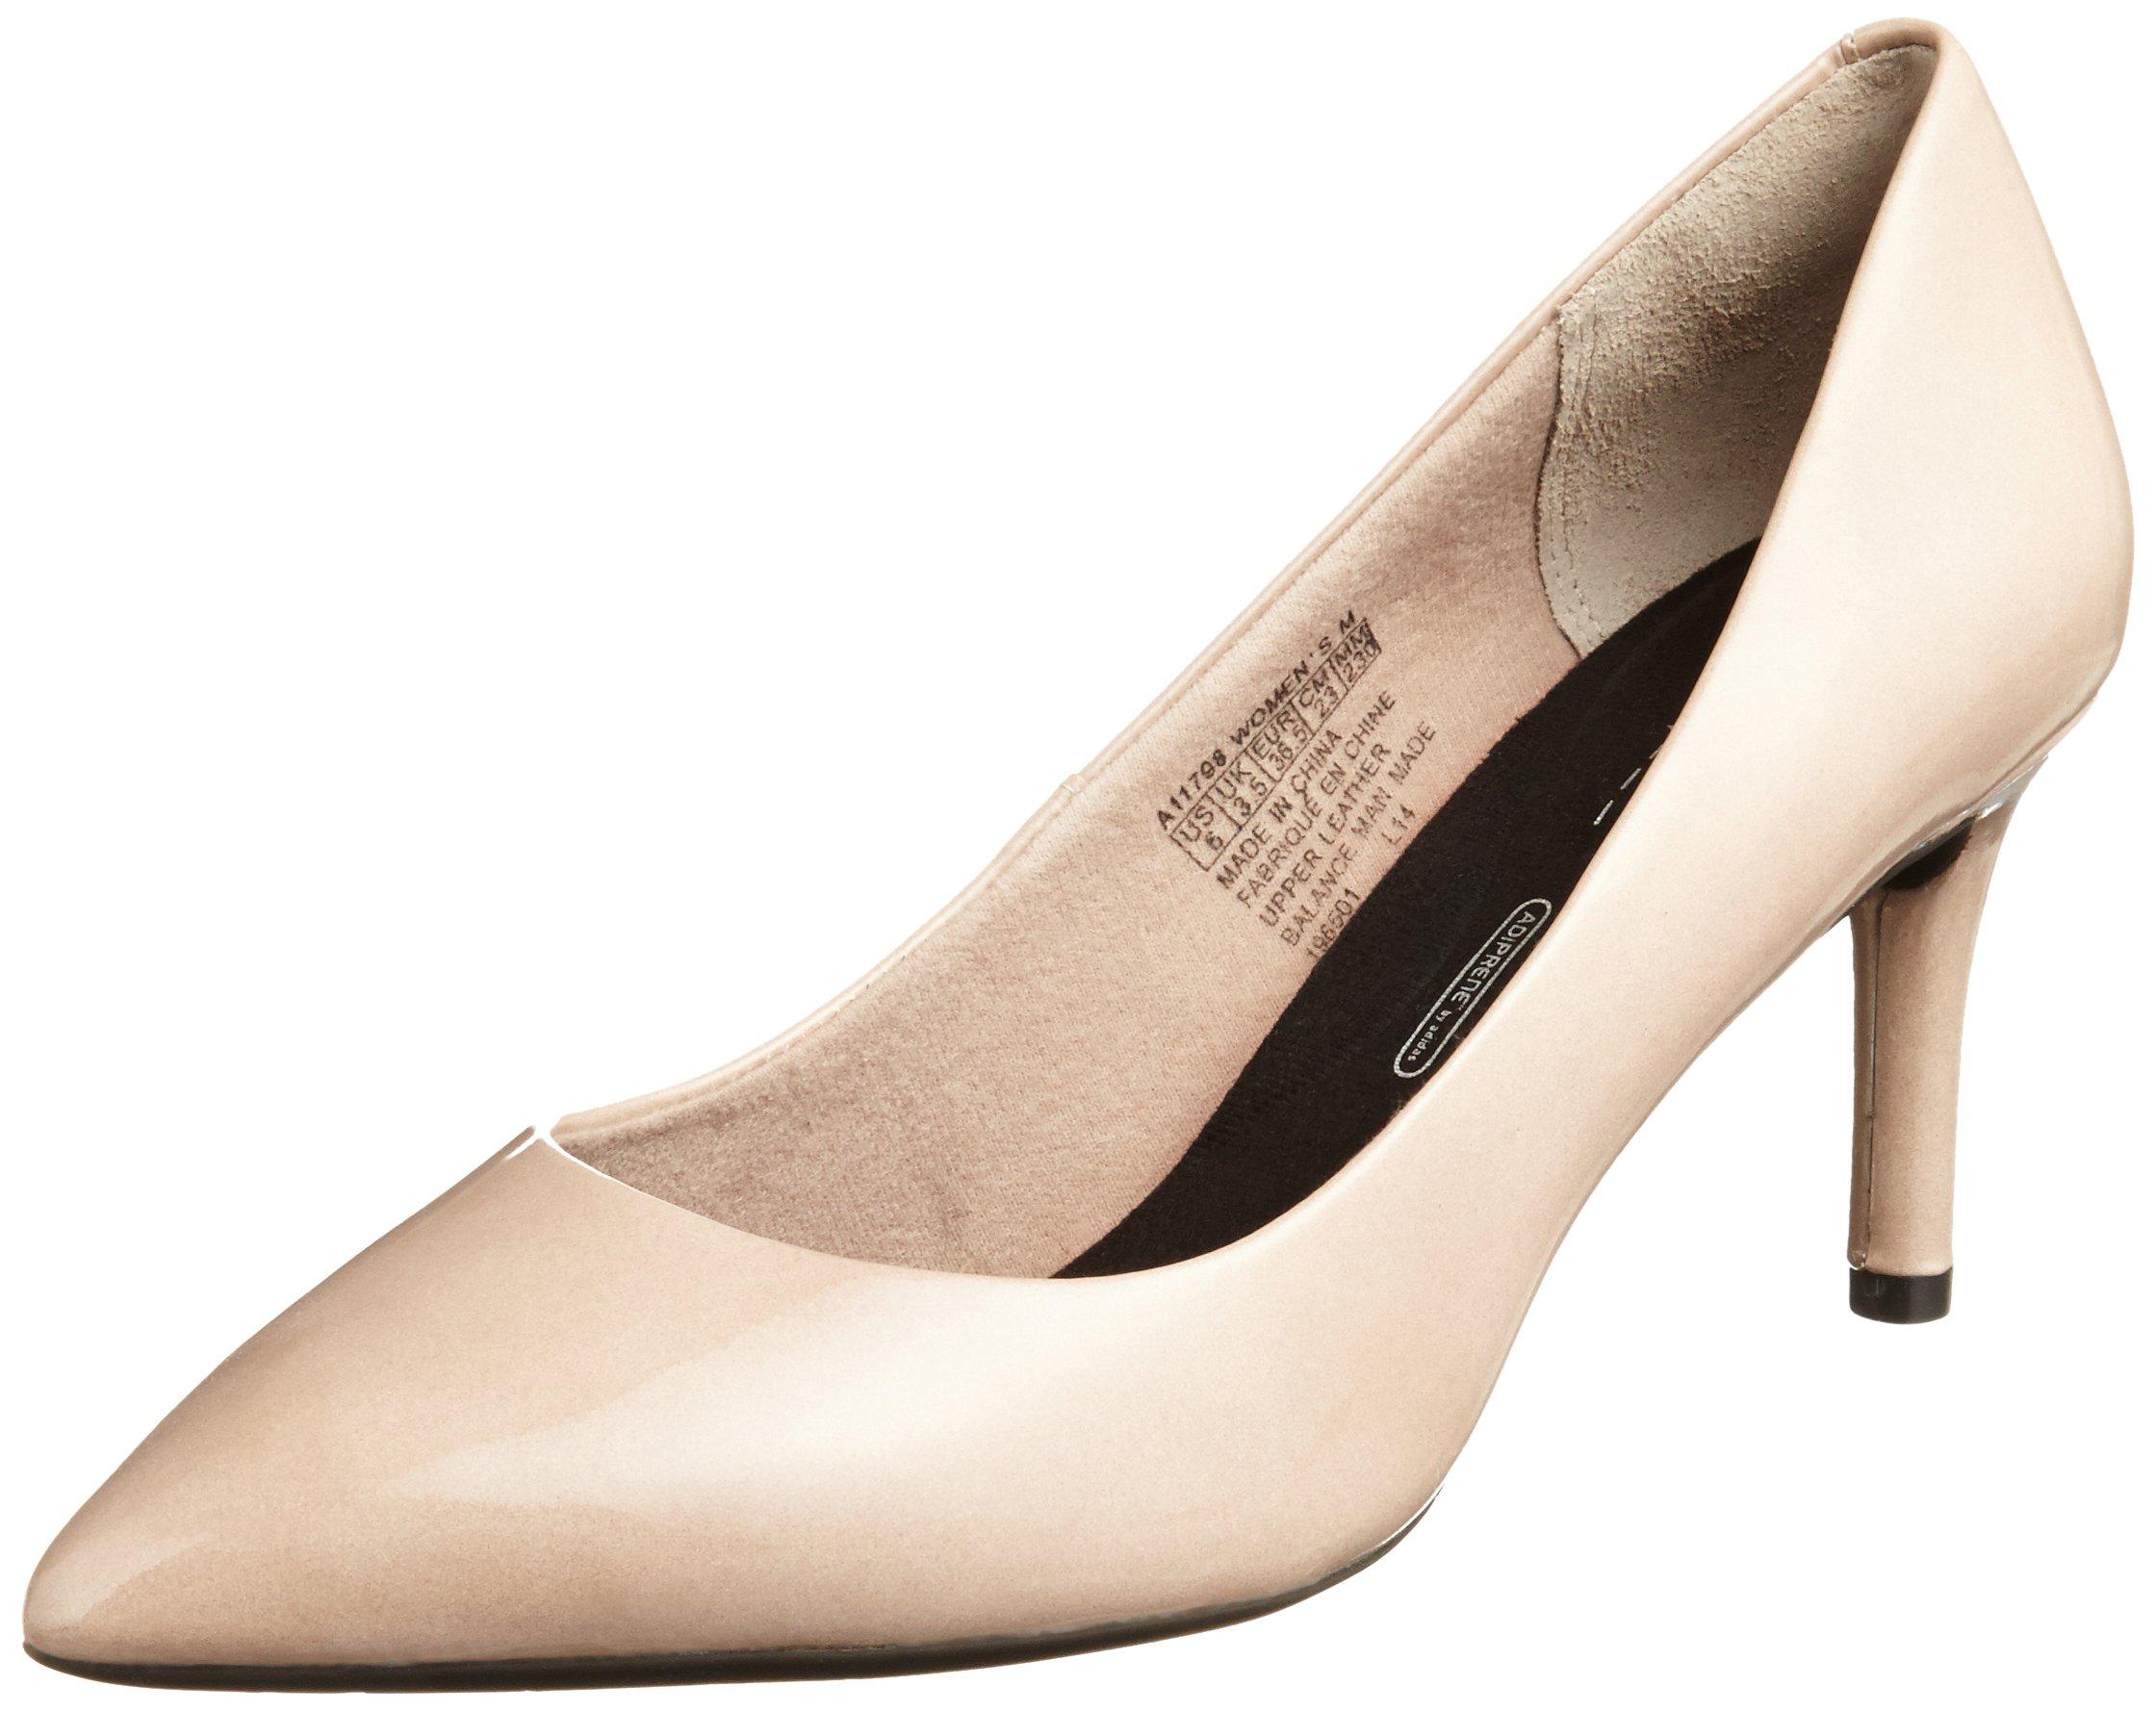 Taupe 281385 Eu Chaussures Pieds Tm75mmpth Pump Couvert FemmeBeigewarm À TalonsAvant Du Rockport Plain OPkX8n0w